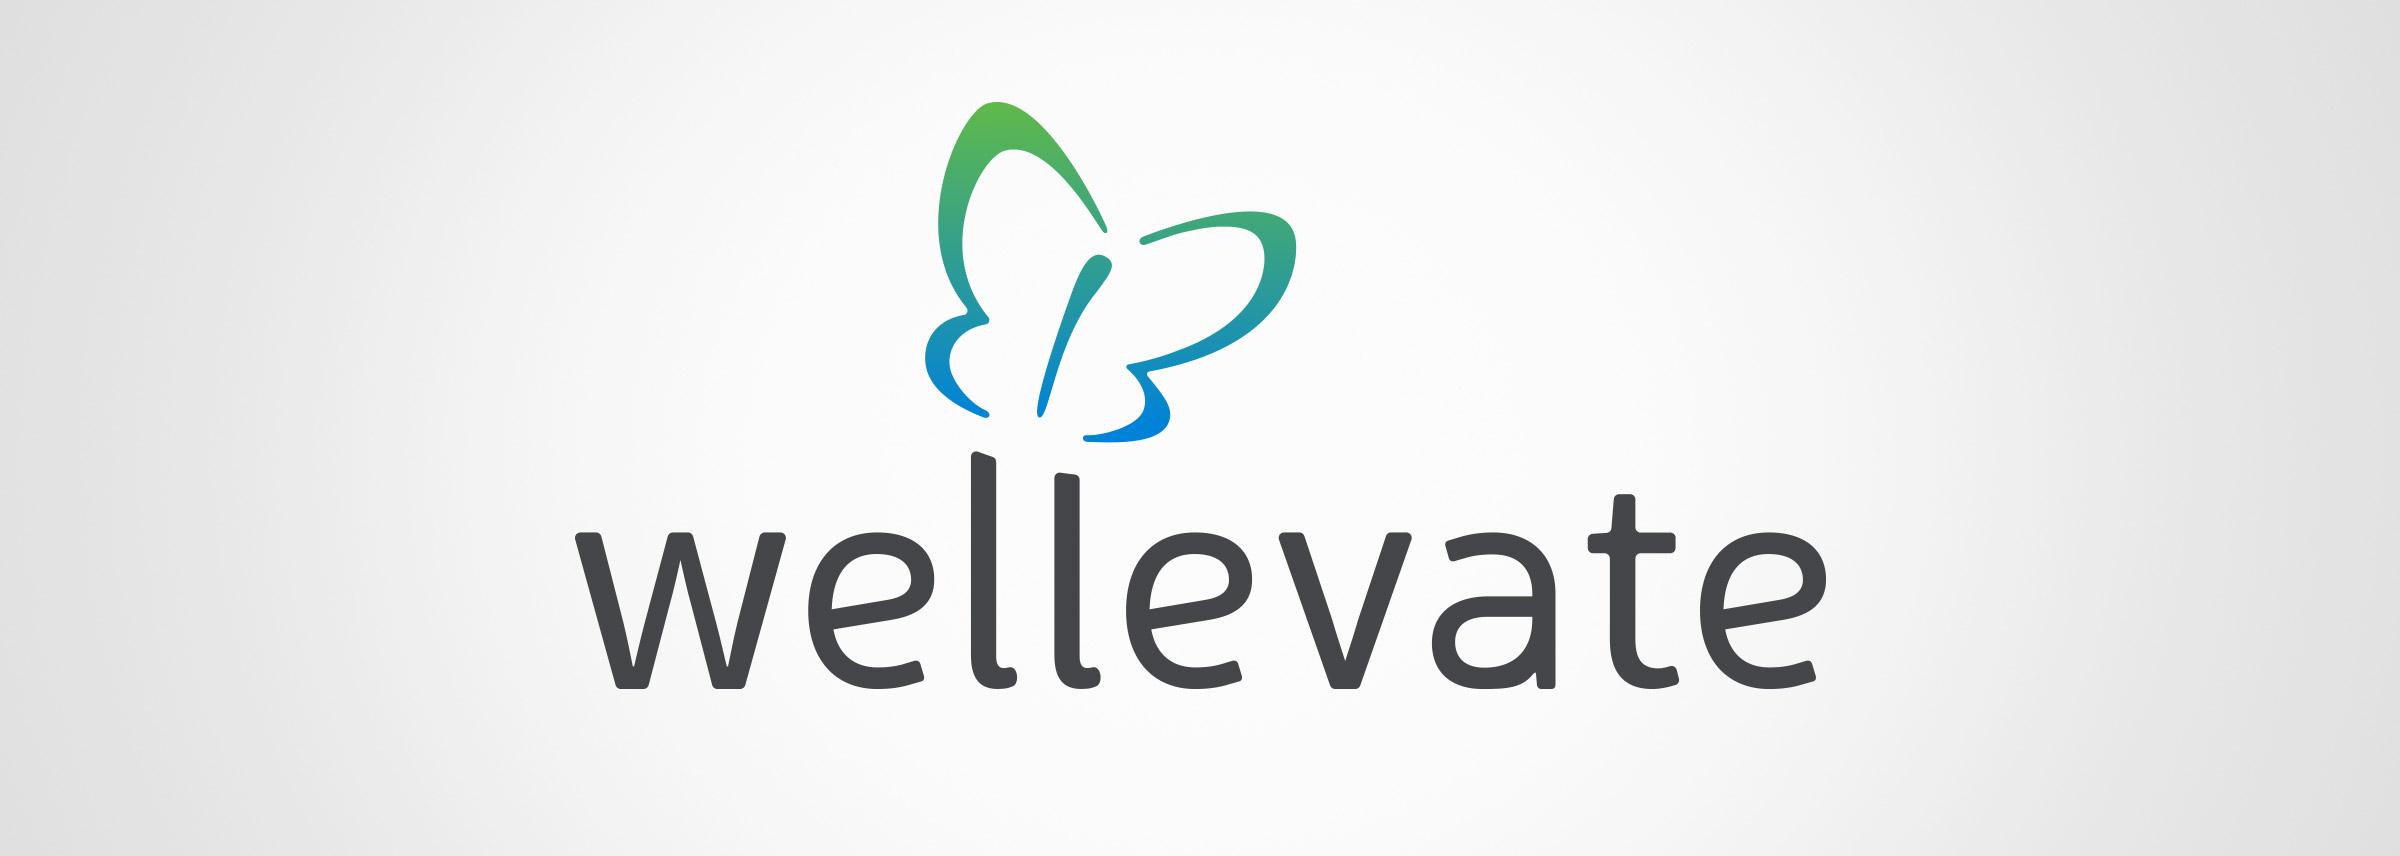 VL-Wellevate-02